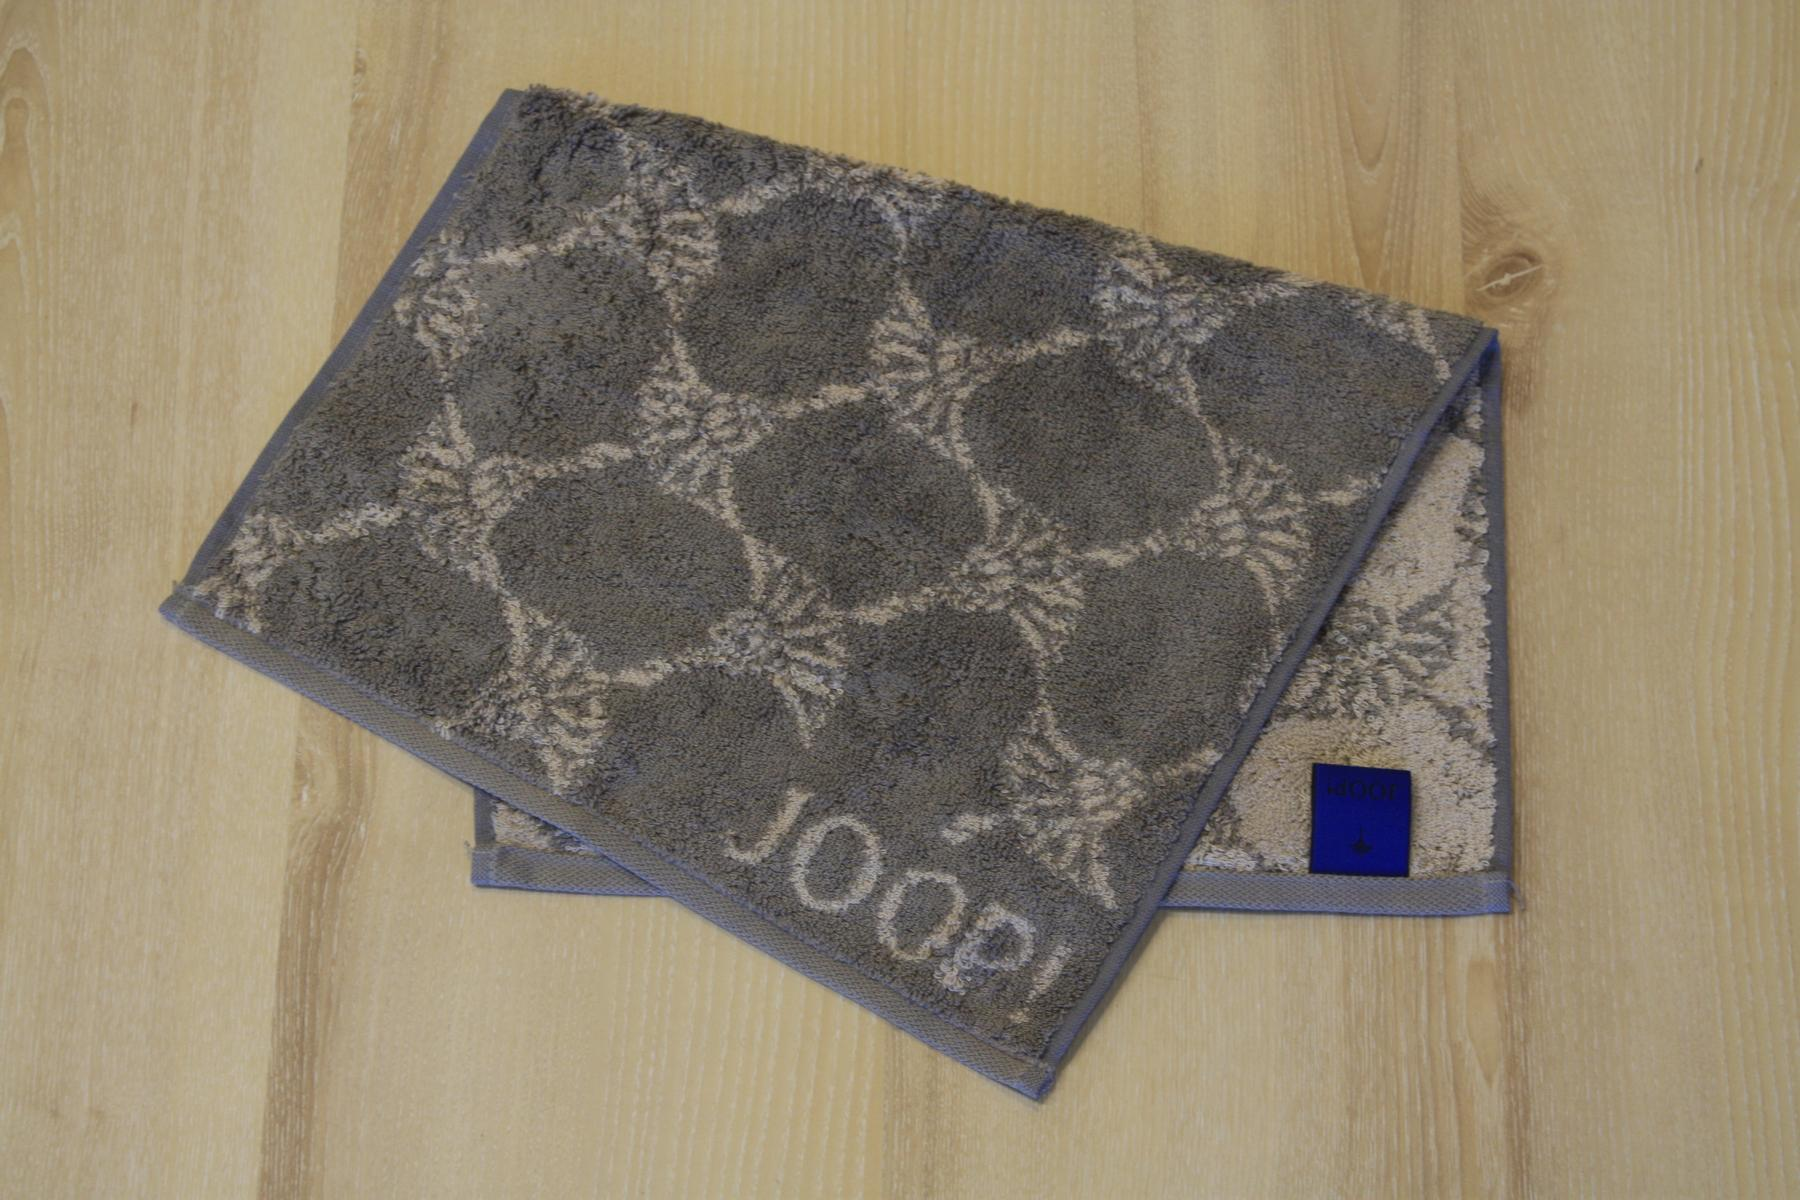 JOOP Handtuch Gästetuch 1600 Doubleface 70 Graphit 30x50cm